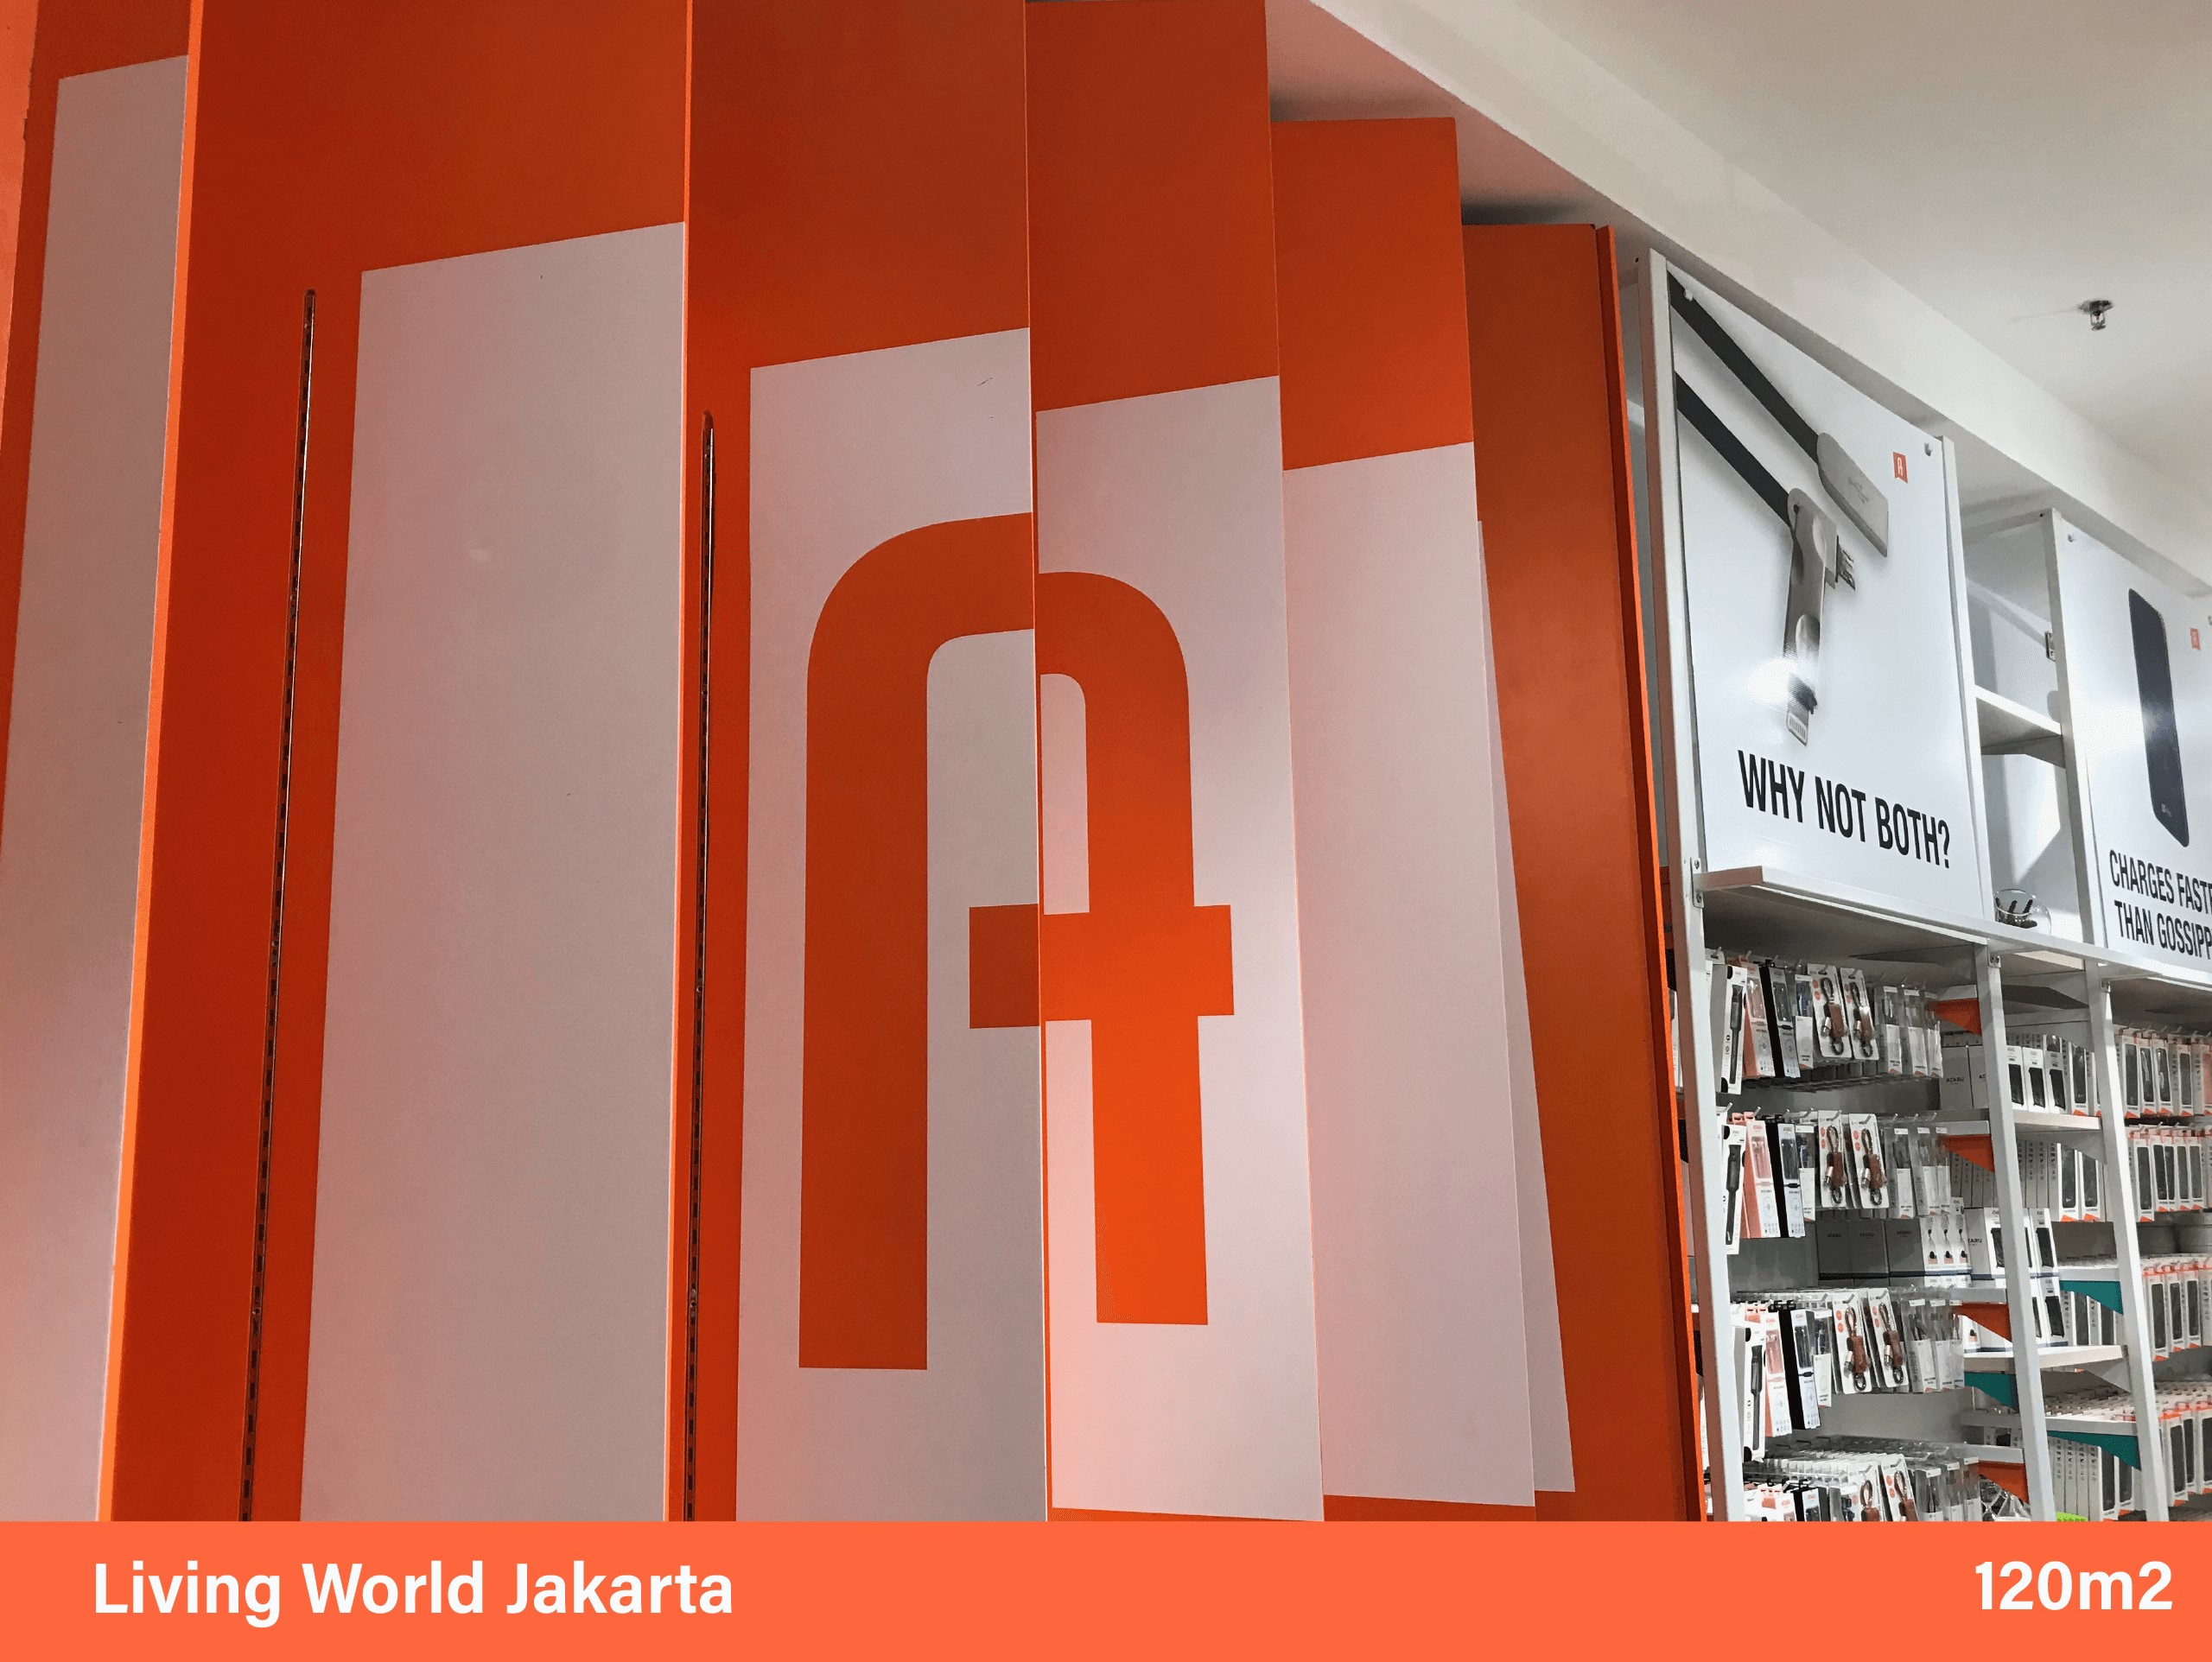 Ataru instore marketing banner and flag with designer logo